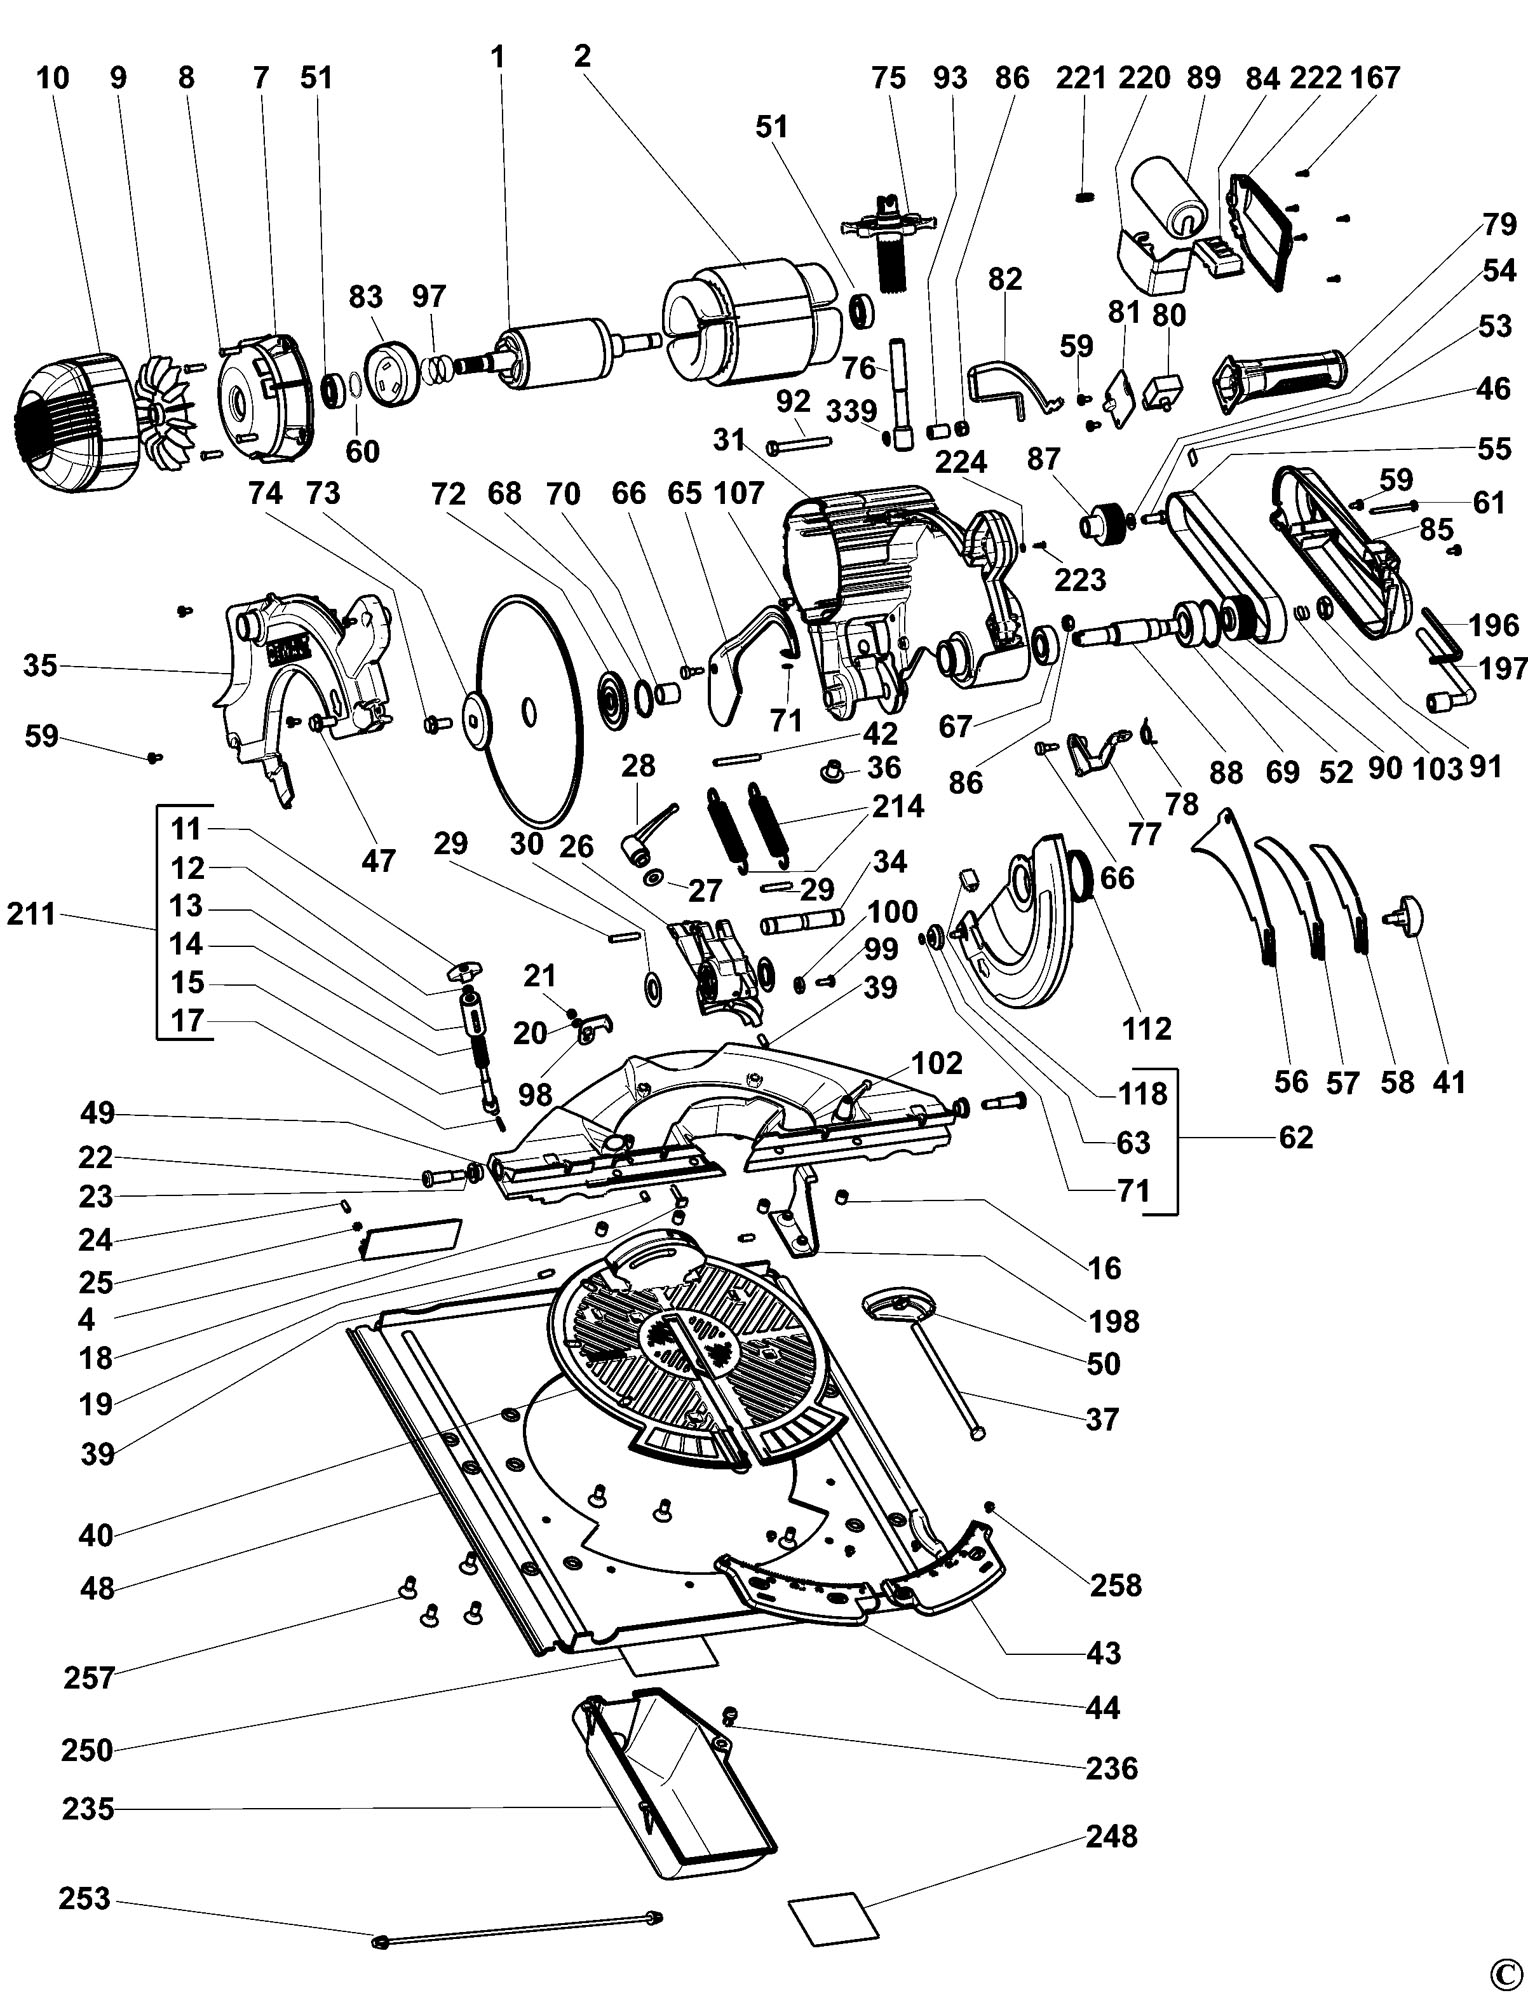 Spares for Dewalt Dw743 Combination Saw (type 5) SPARE